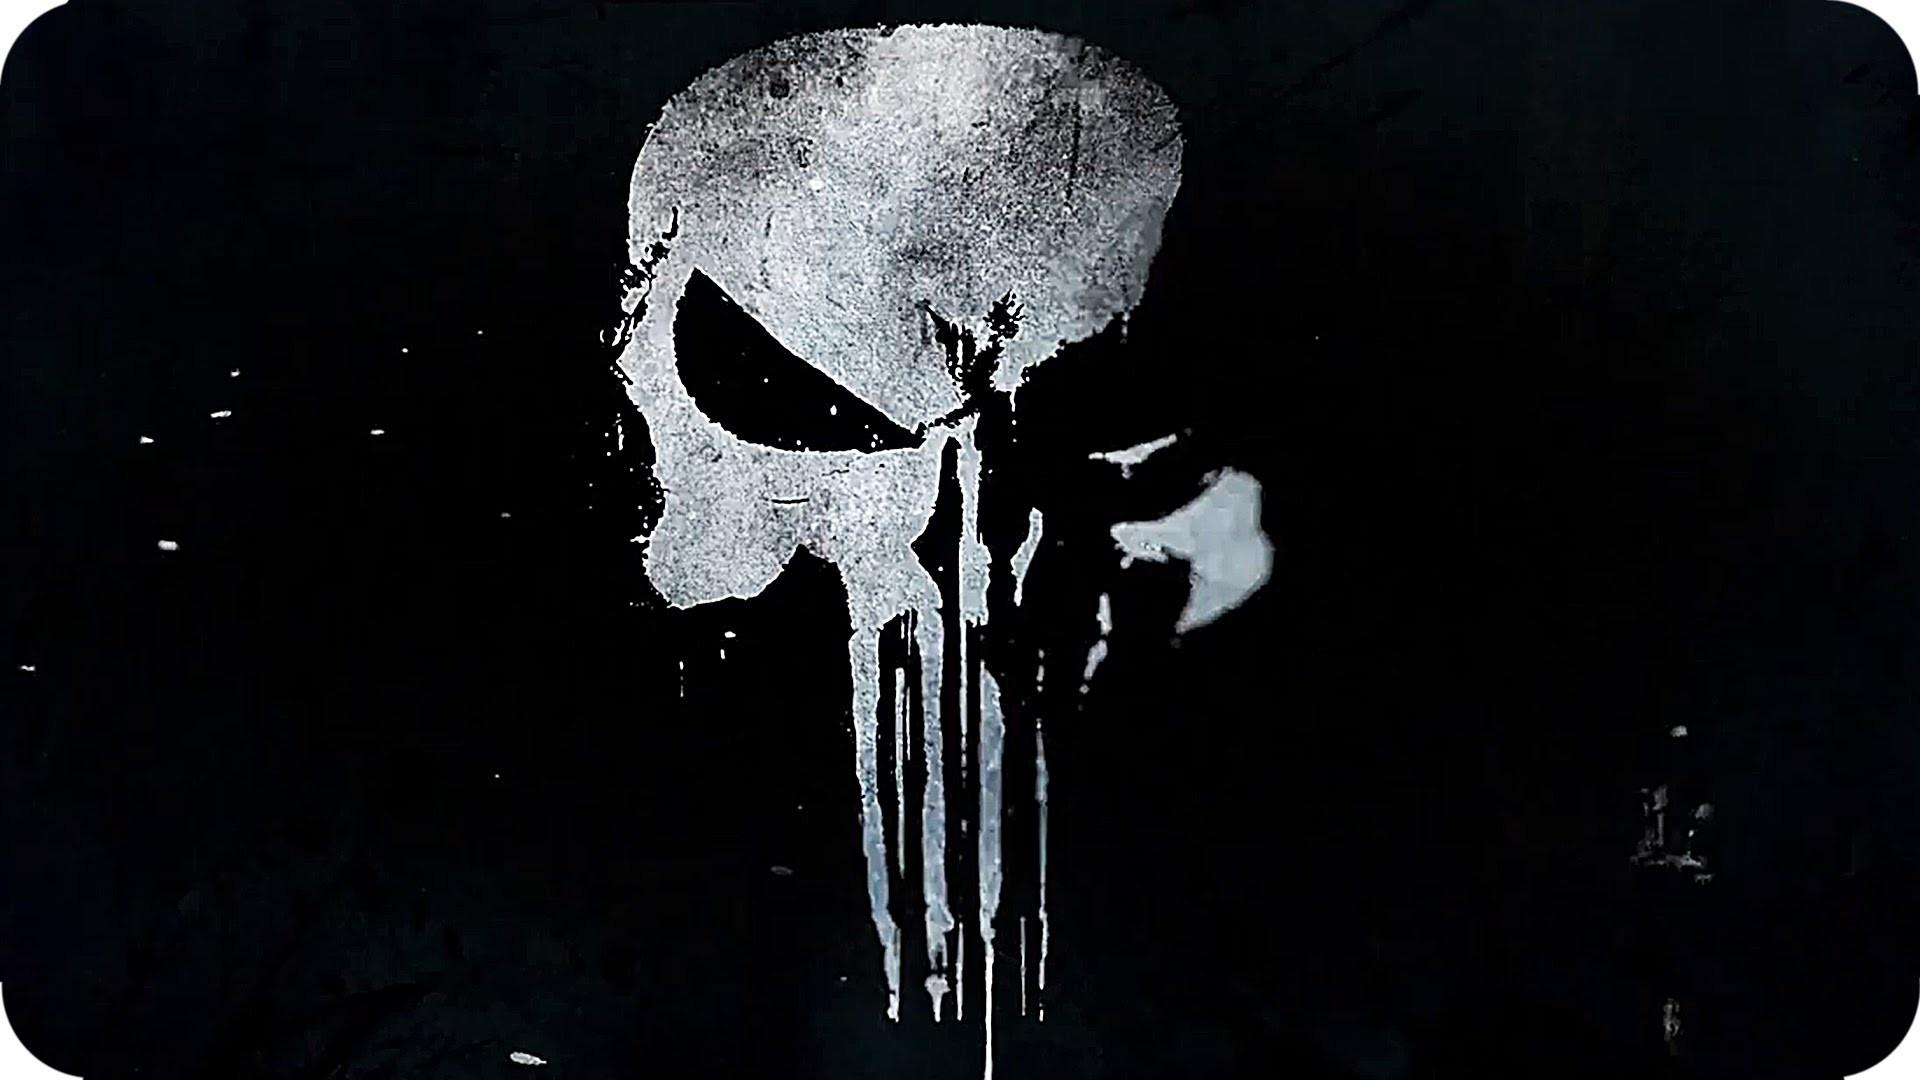 Amazing Wallpaper Marvel Punisher - 488636  Image_4857.jpg